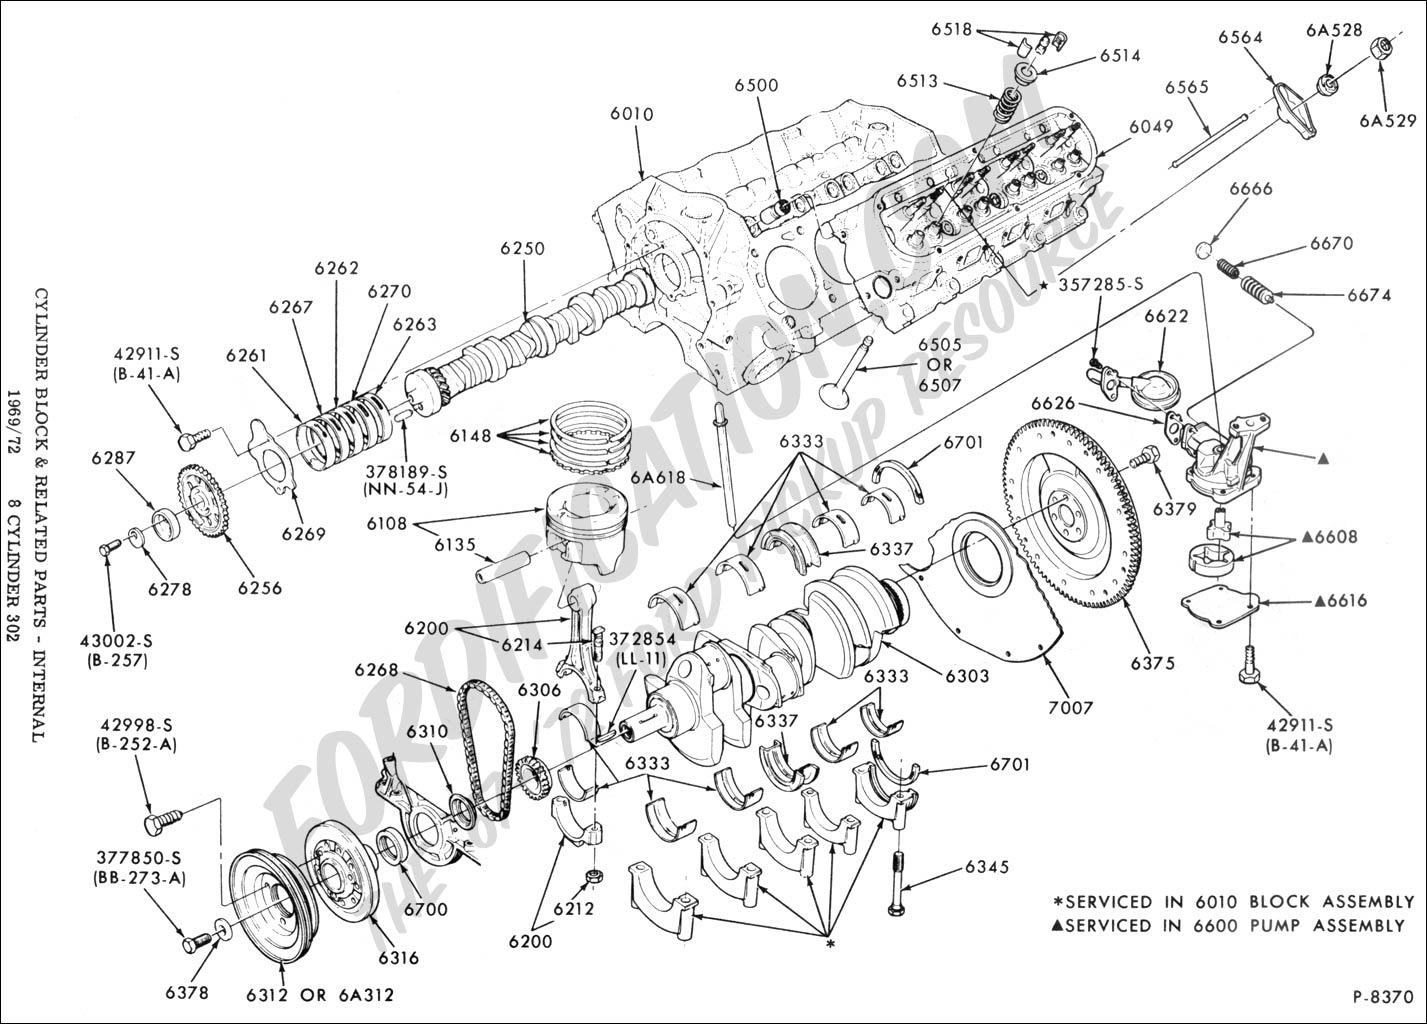 1986 mustang 302 engine diagram